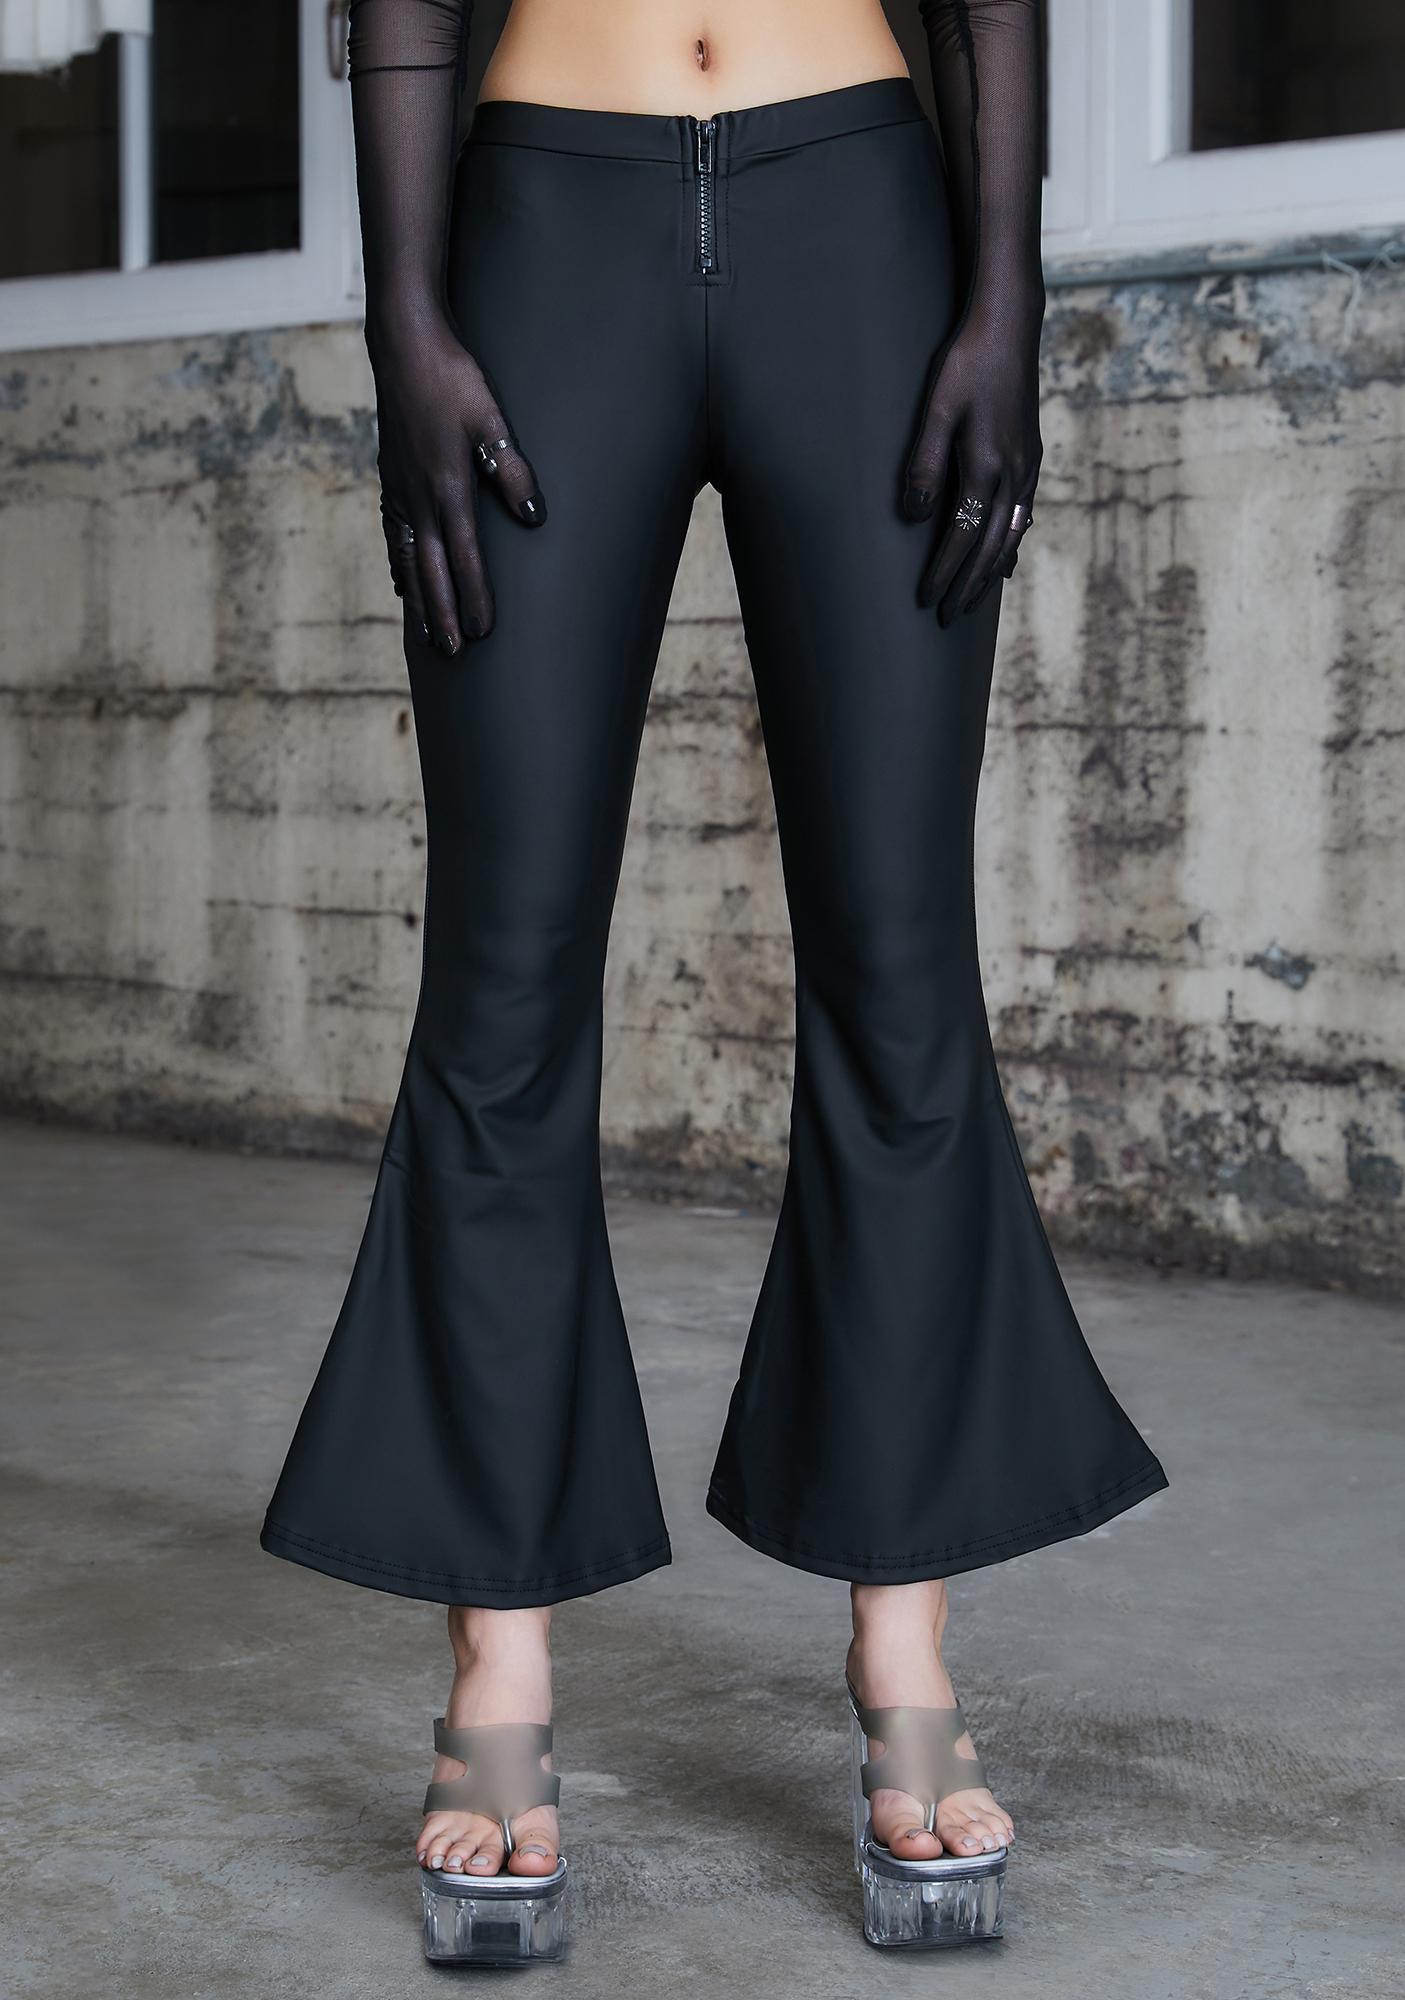 DARKER WAVS Kickdrum Matte Black Flare Pants